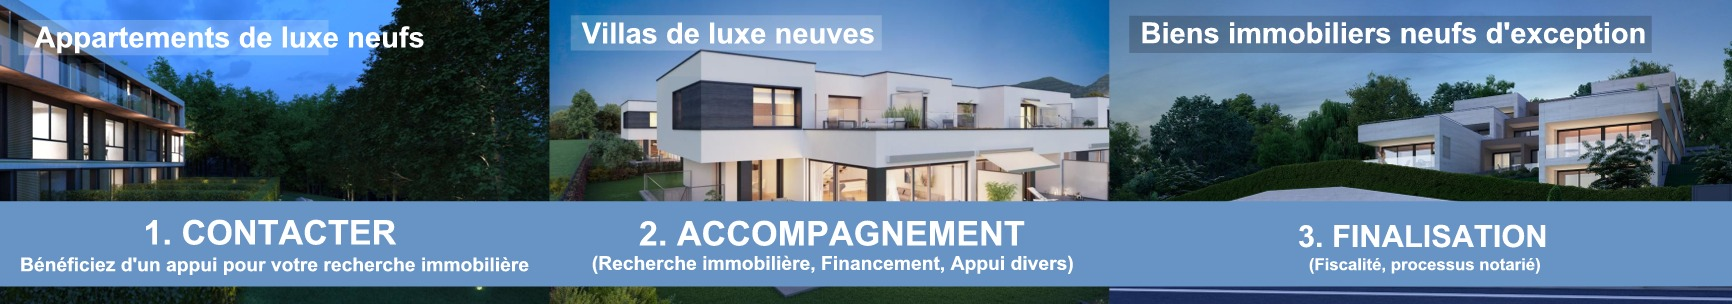 promotion immobiliere de prestige luxe geneve